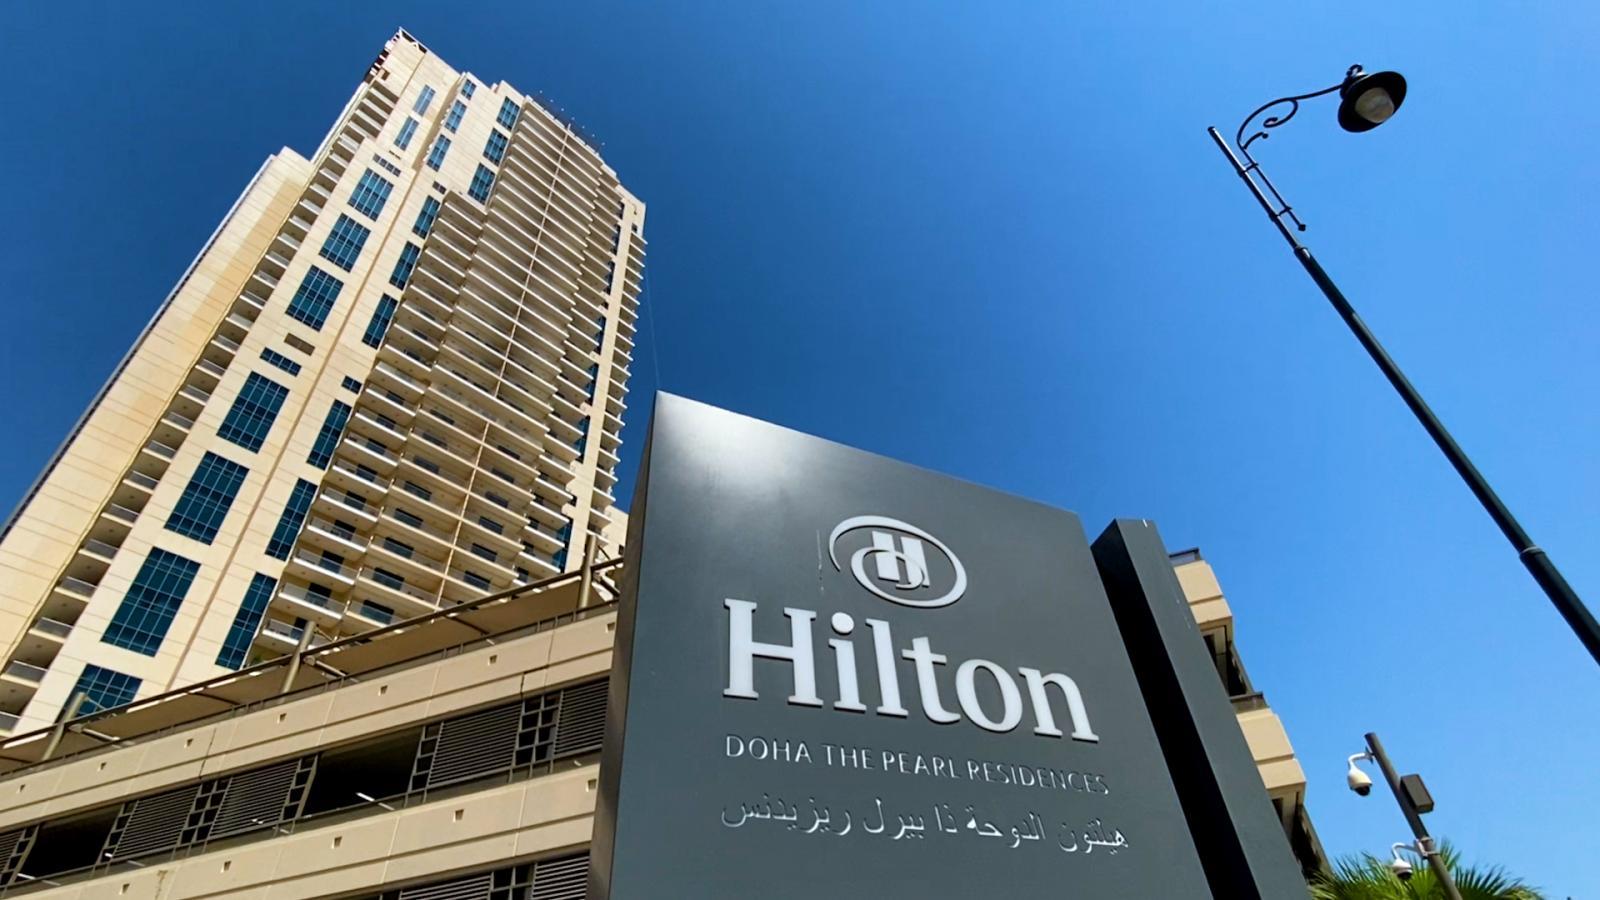 WATCH: A walkthrough of Hilton Doha - The Pearl Residences